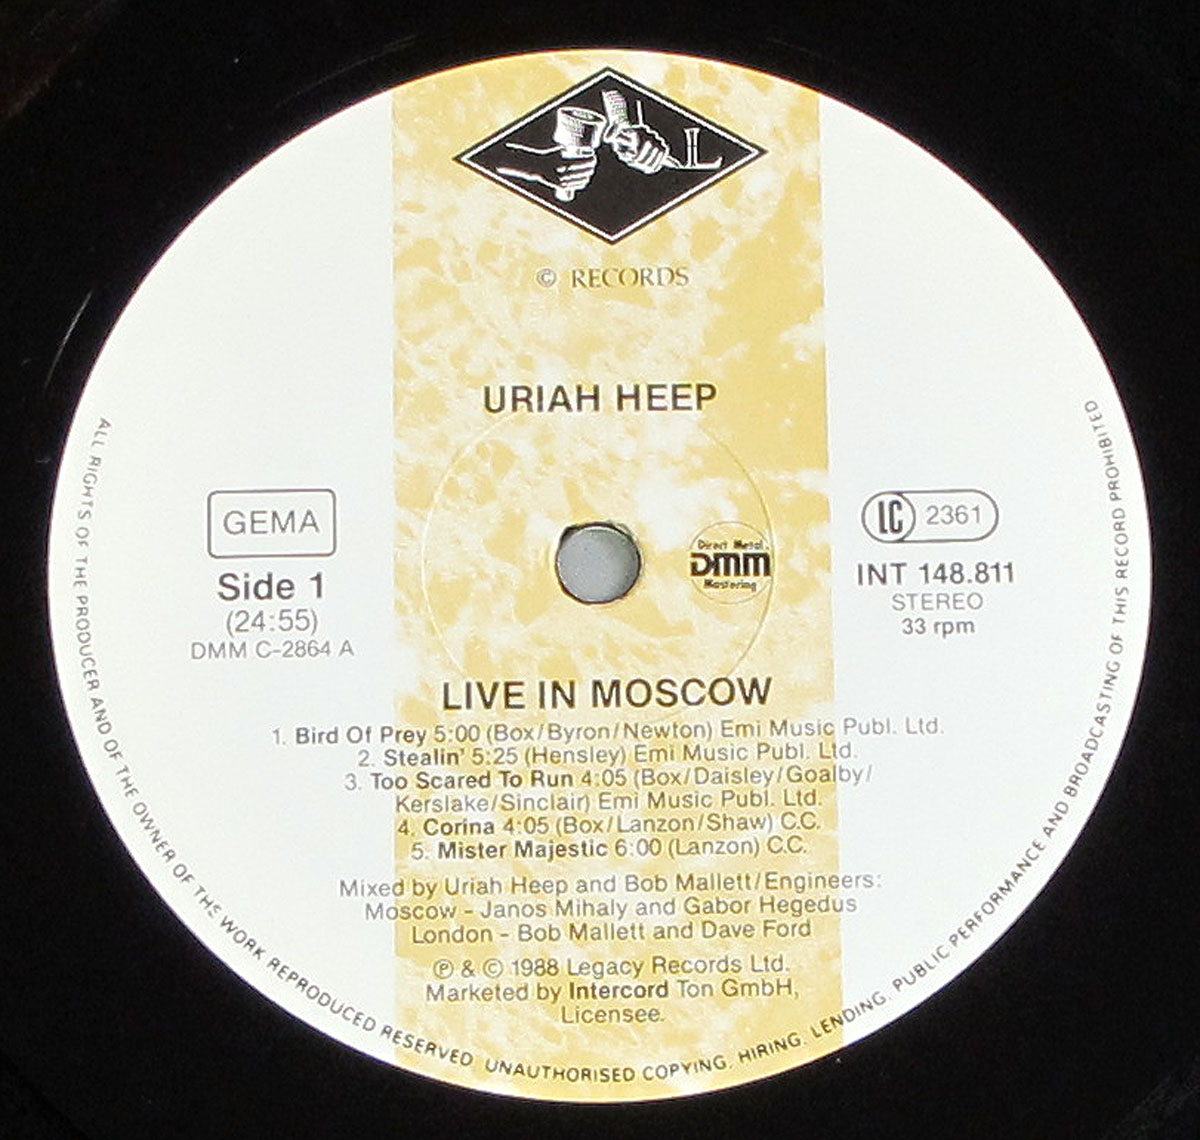 Uriah Heep Live In Moscow Cam B Mockbe Gatefold 12 Lp Vinyl Album Cover Gallery Information Vinylrecords